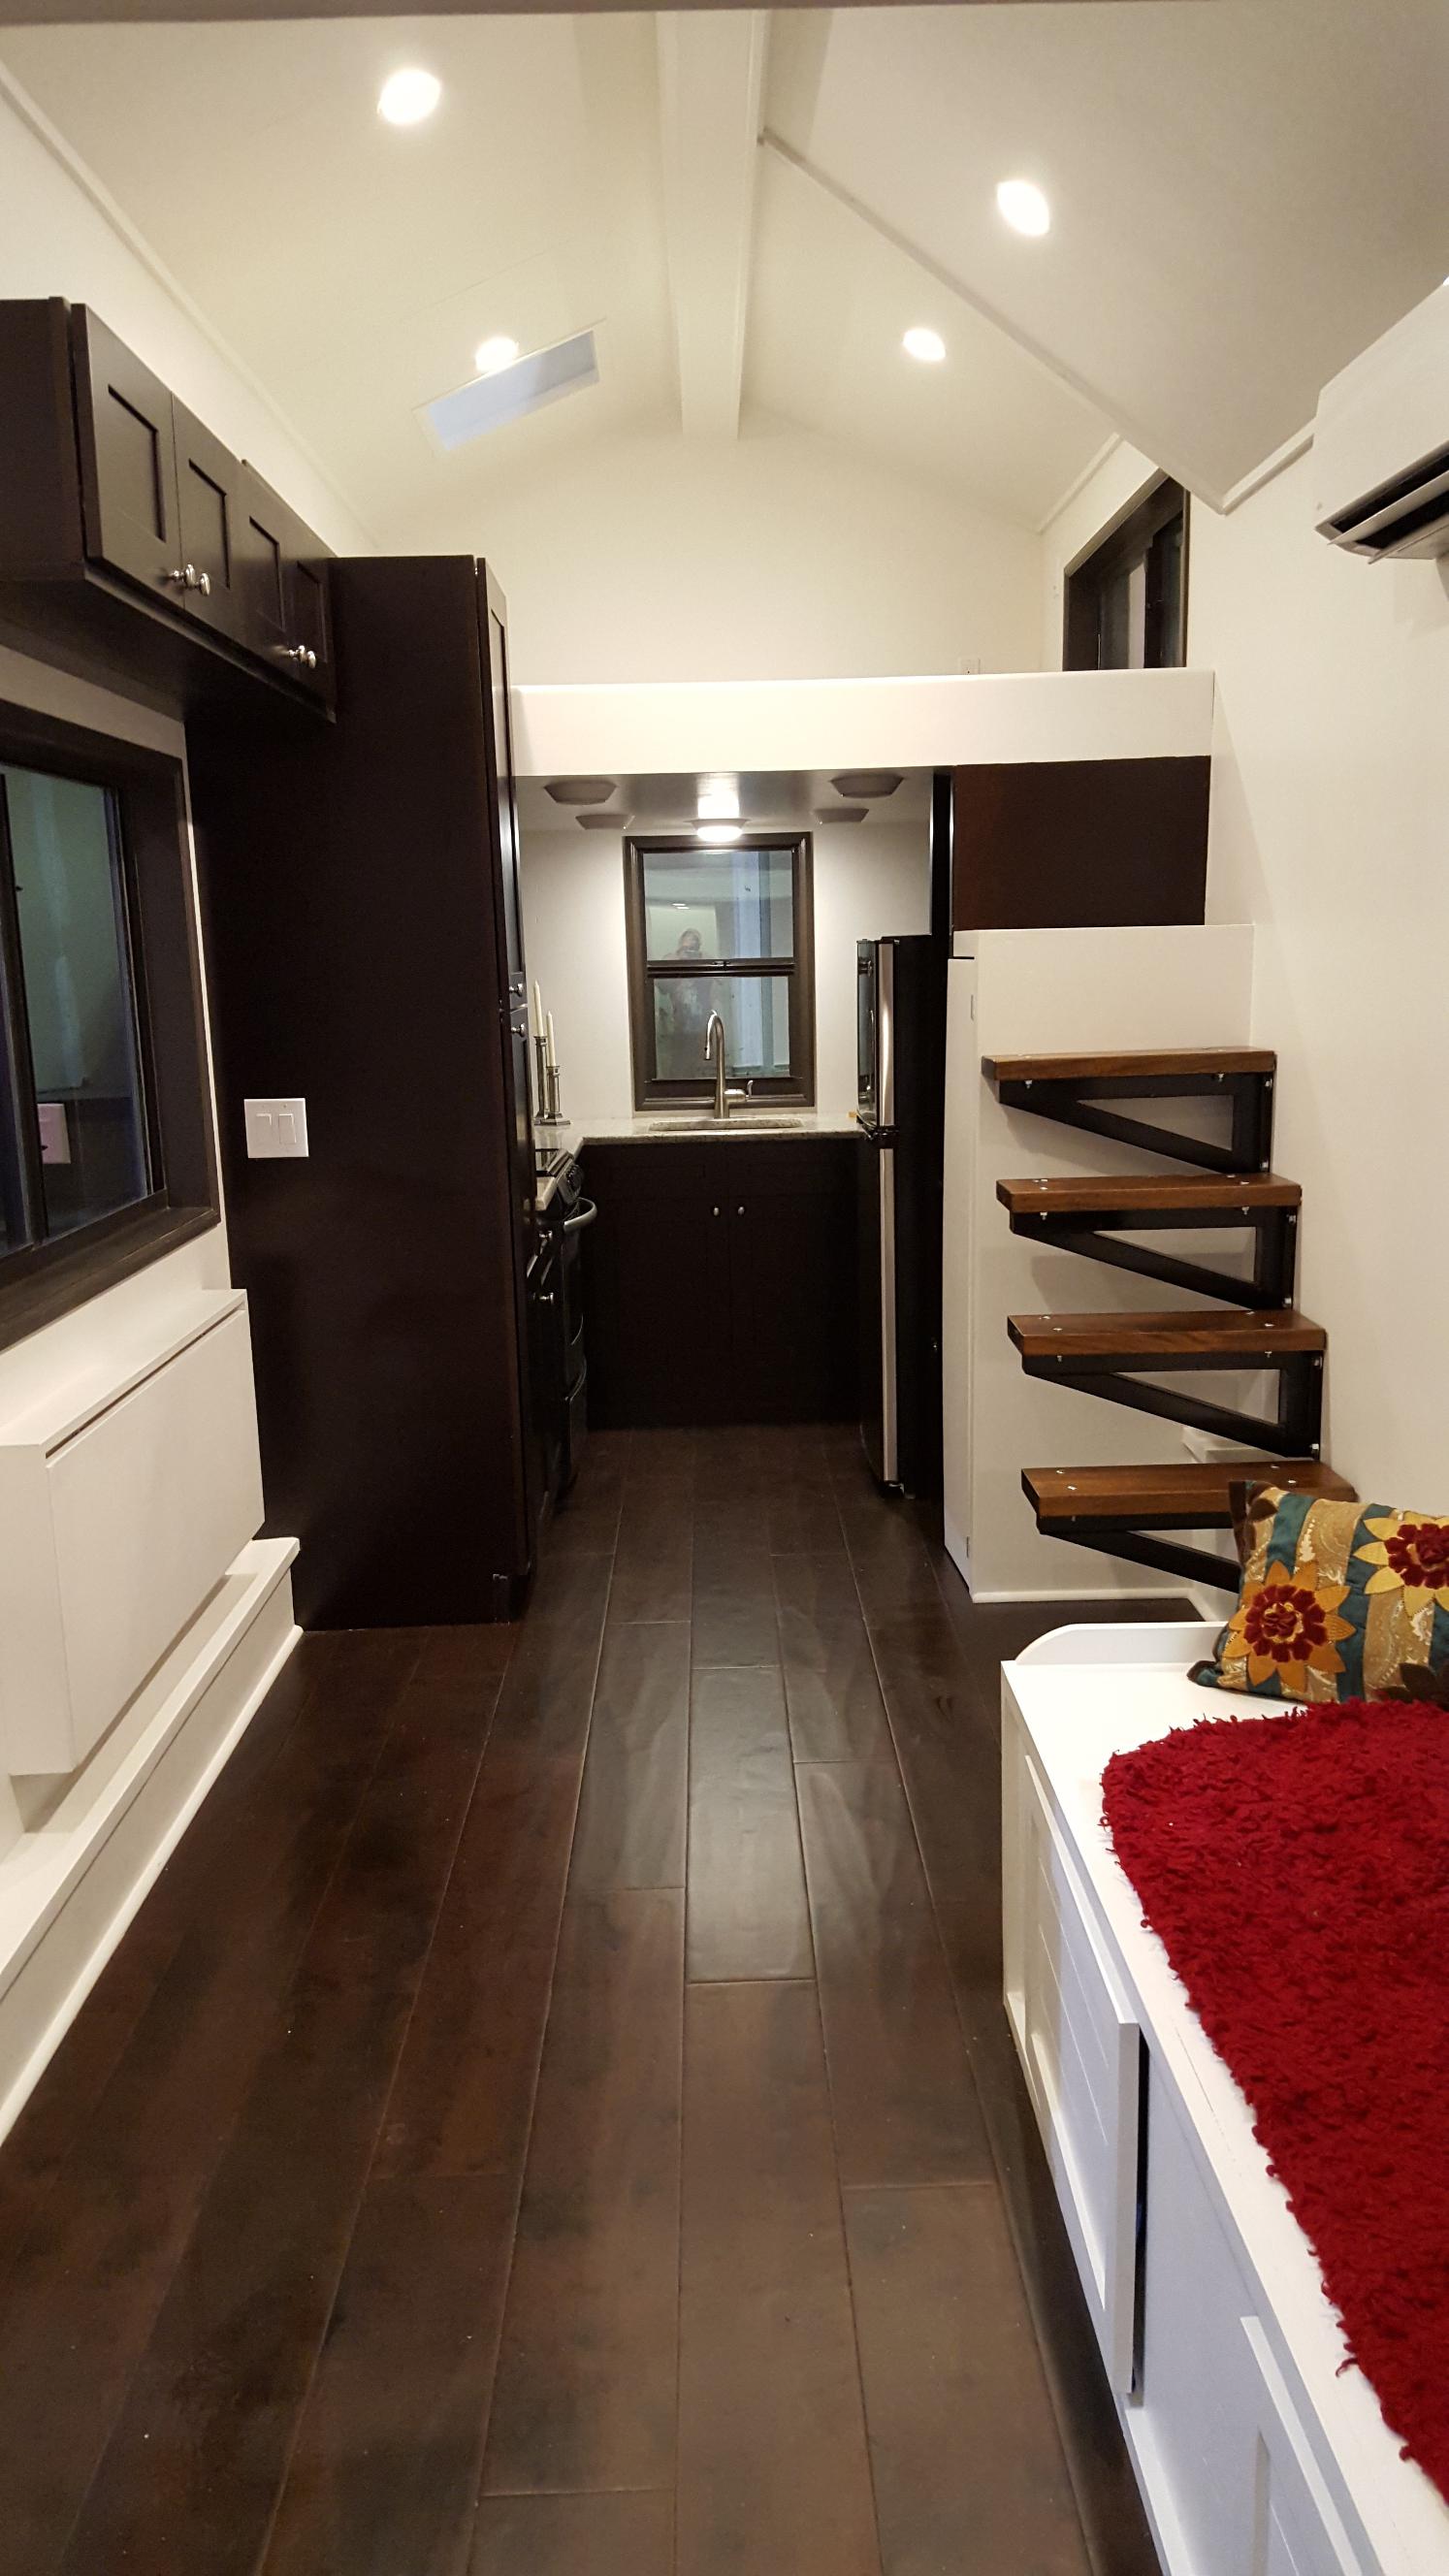 cornerstone tiny homes florida 28 foot tiny house on wheels thow the fontana 2 loft 2. Black Bedroom Furniture Sets. Home Design Ideas